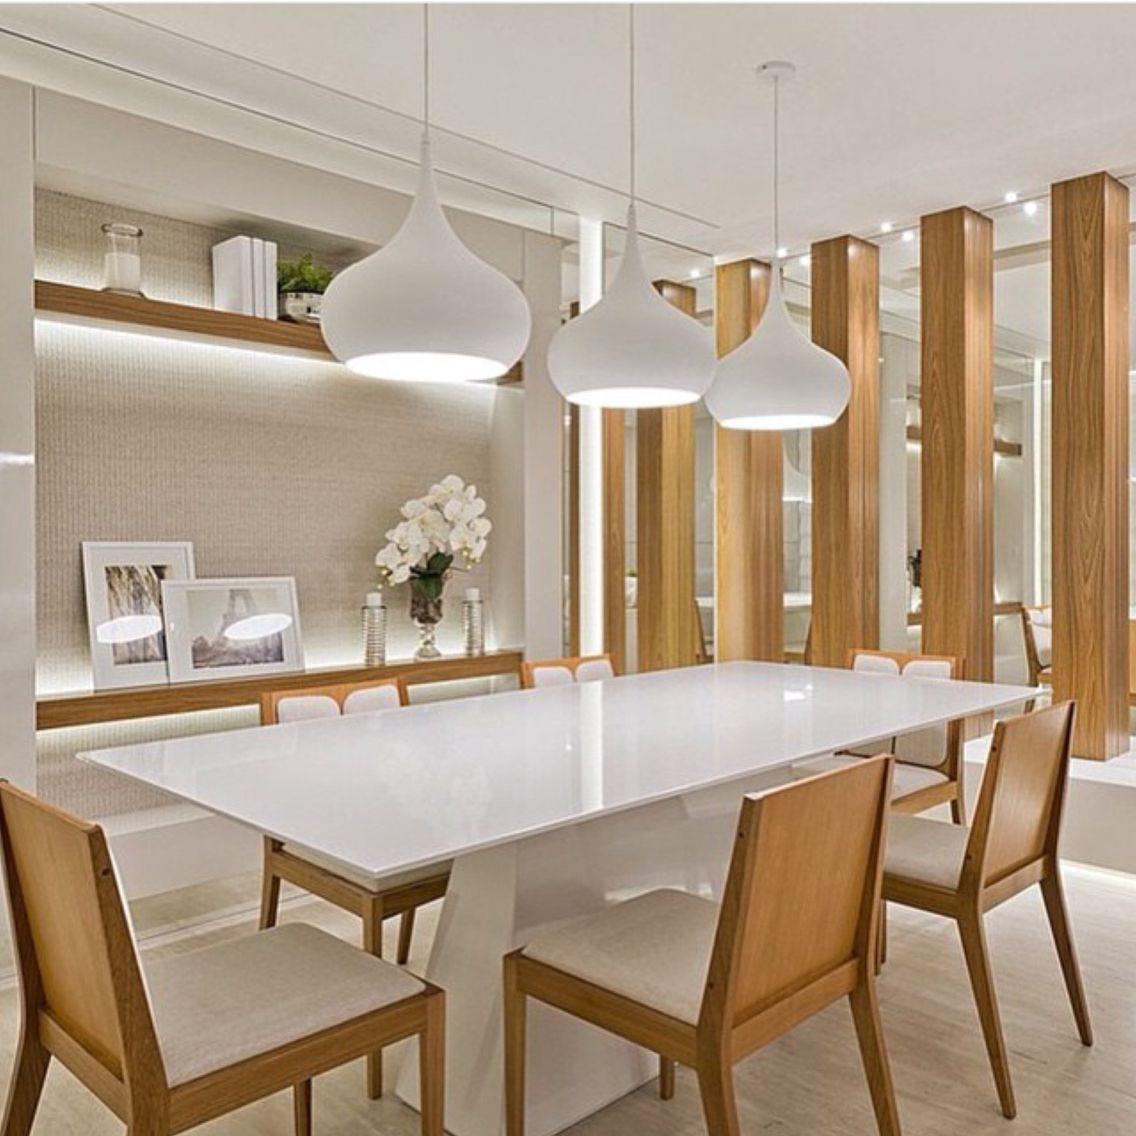 Dining Area Lighting: Modern Dining Room